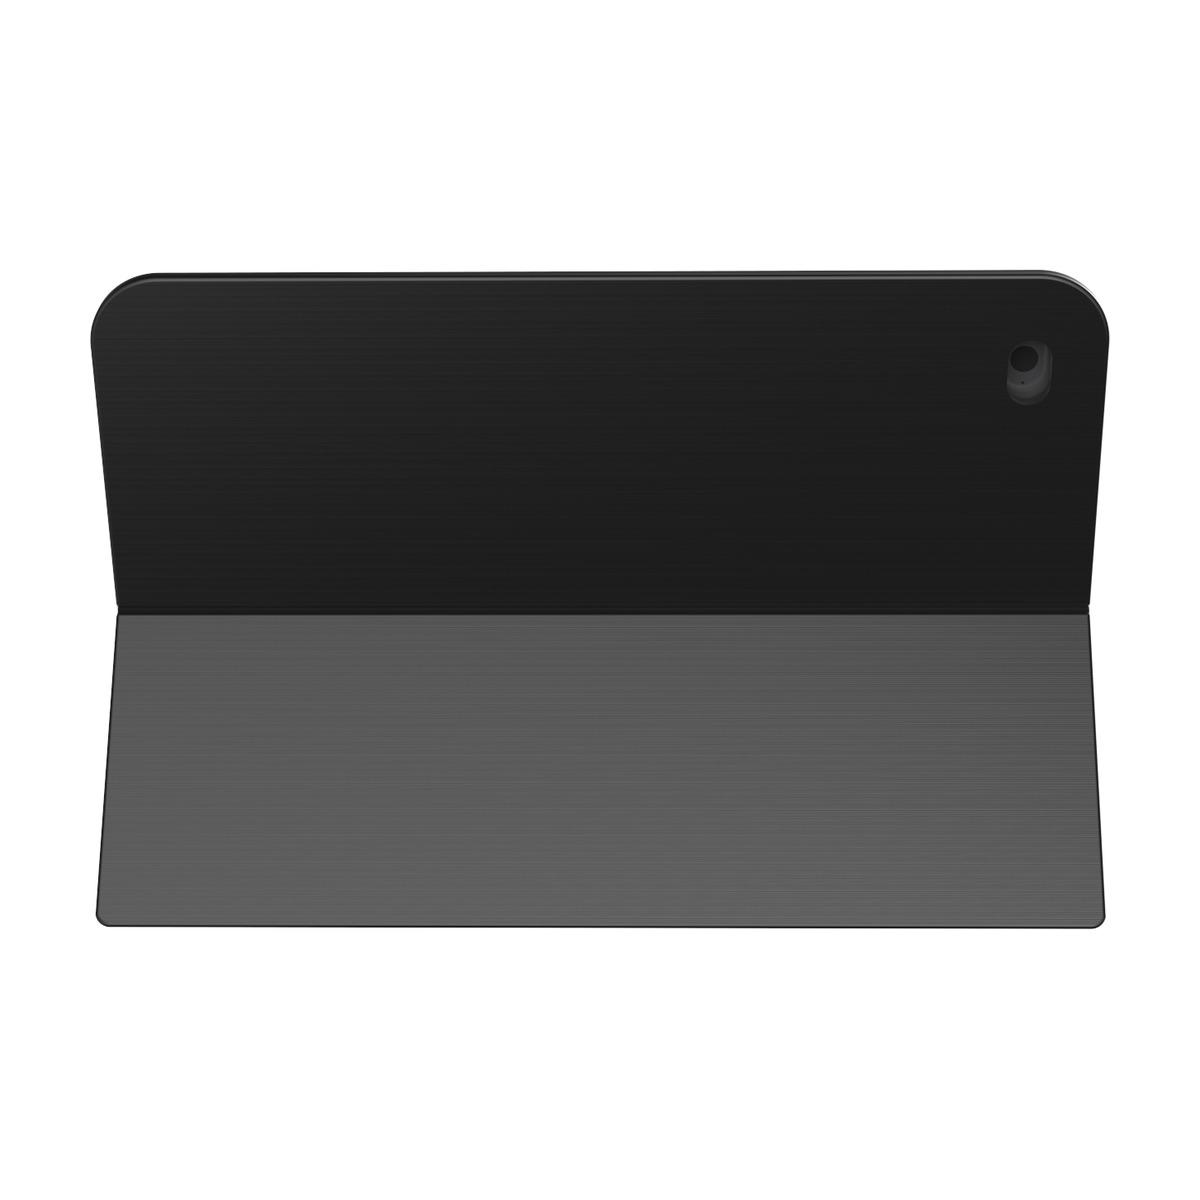 Zagg Keys Cover Vader Backlit IPad mini Norsk Svart | Billig